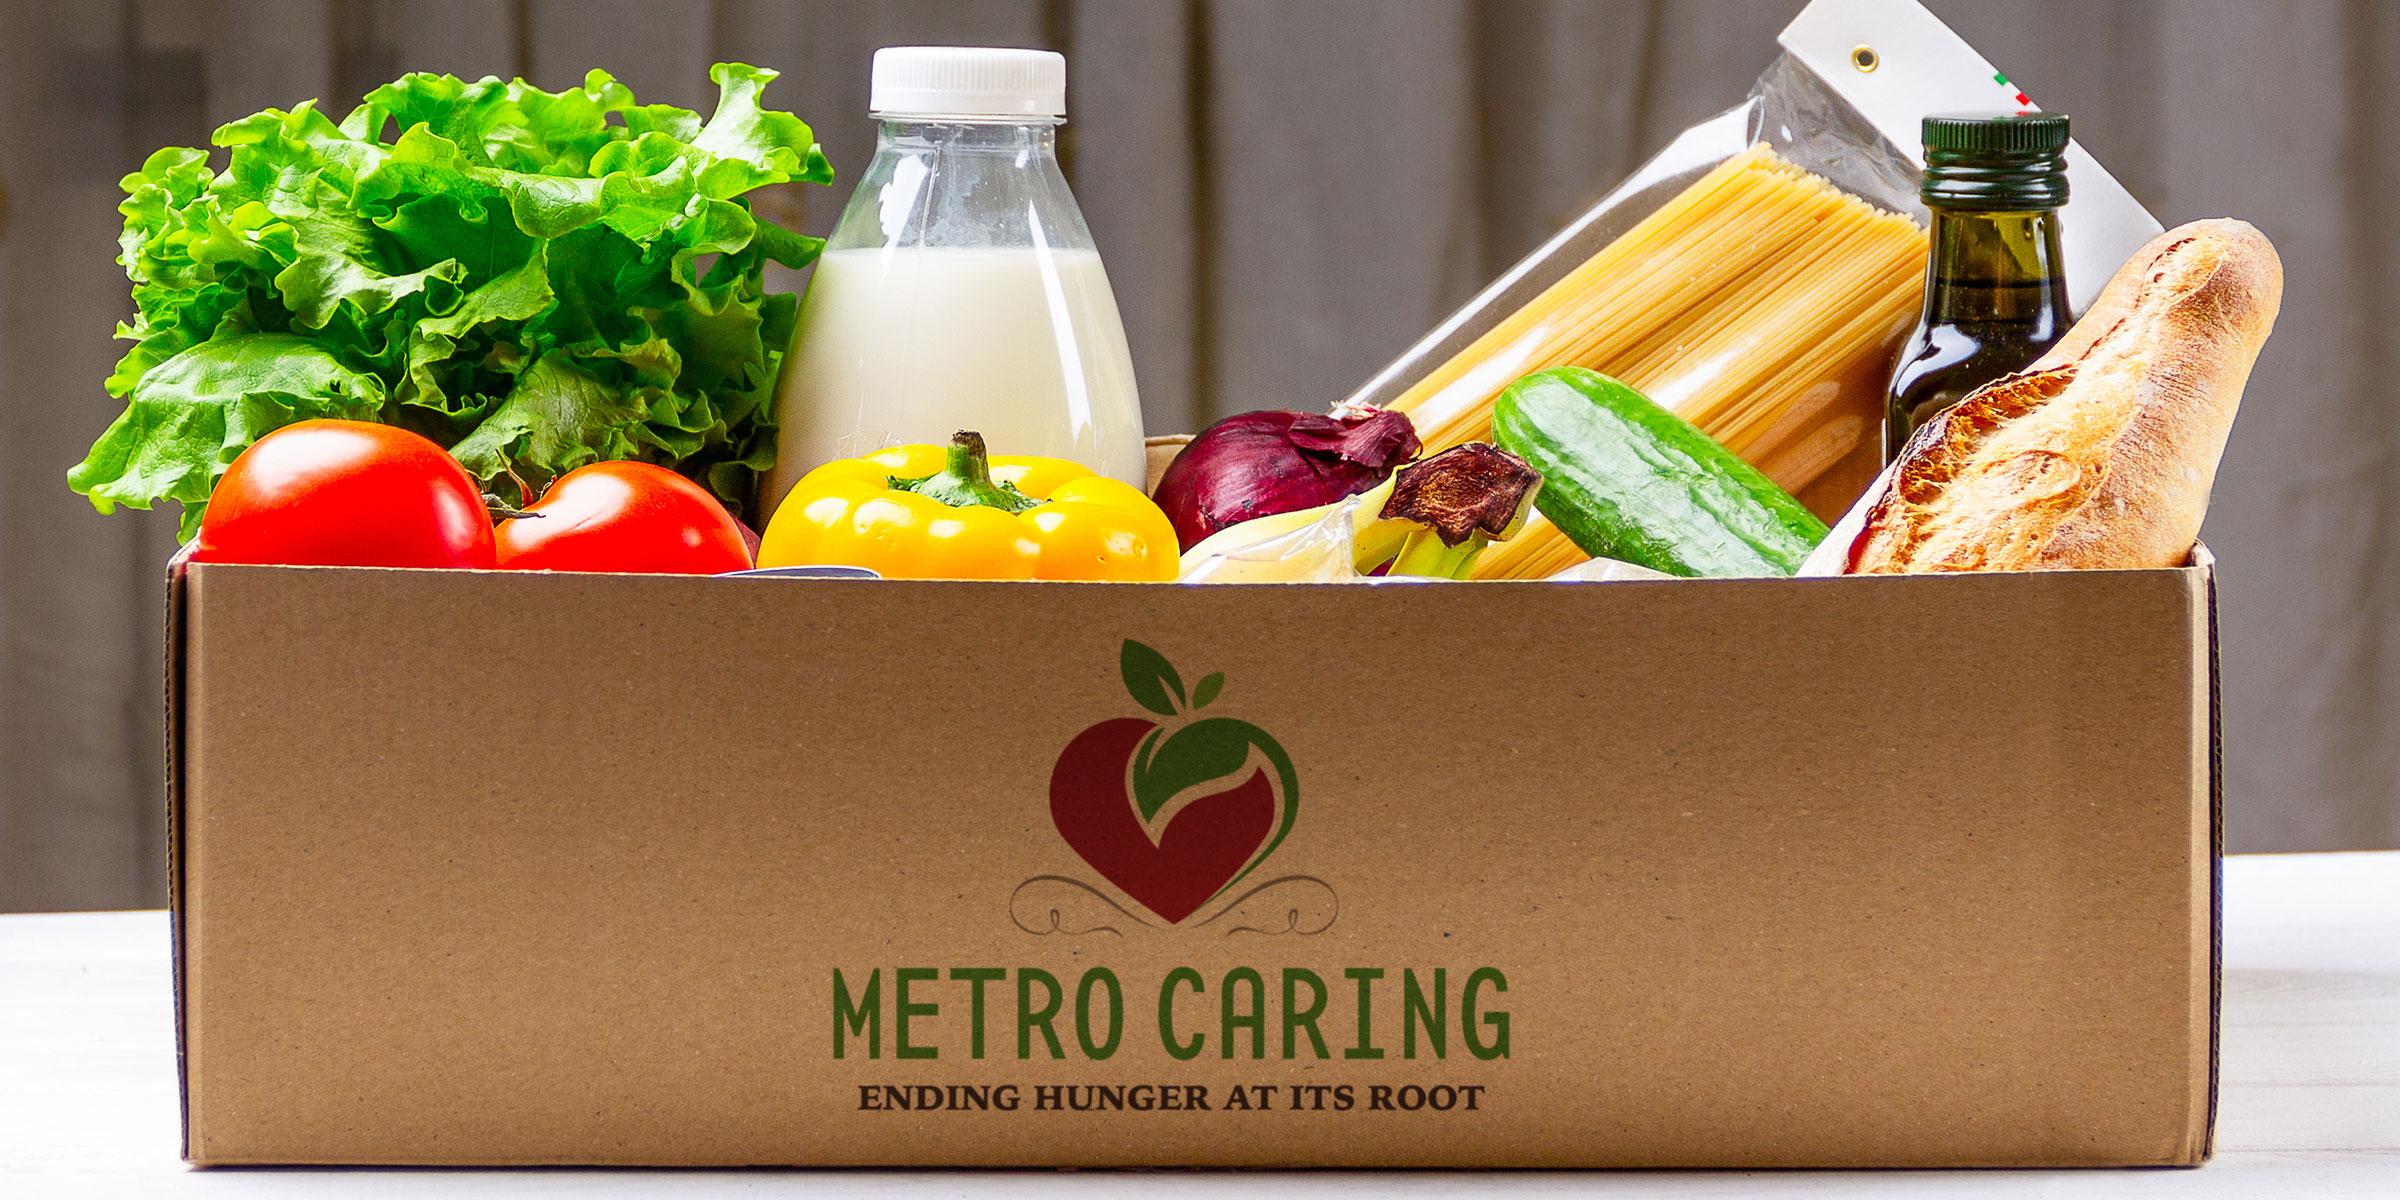 Metro Caring - Colorado's leading frontline hunger-relief organization